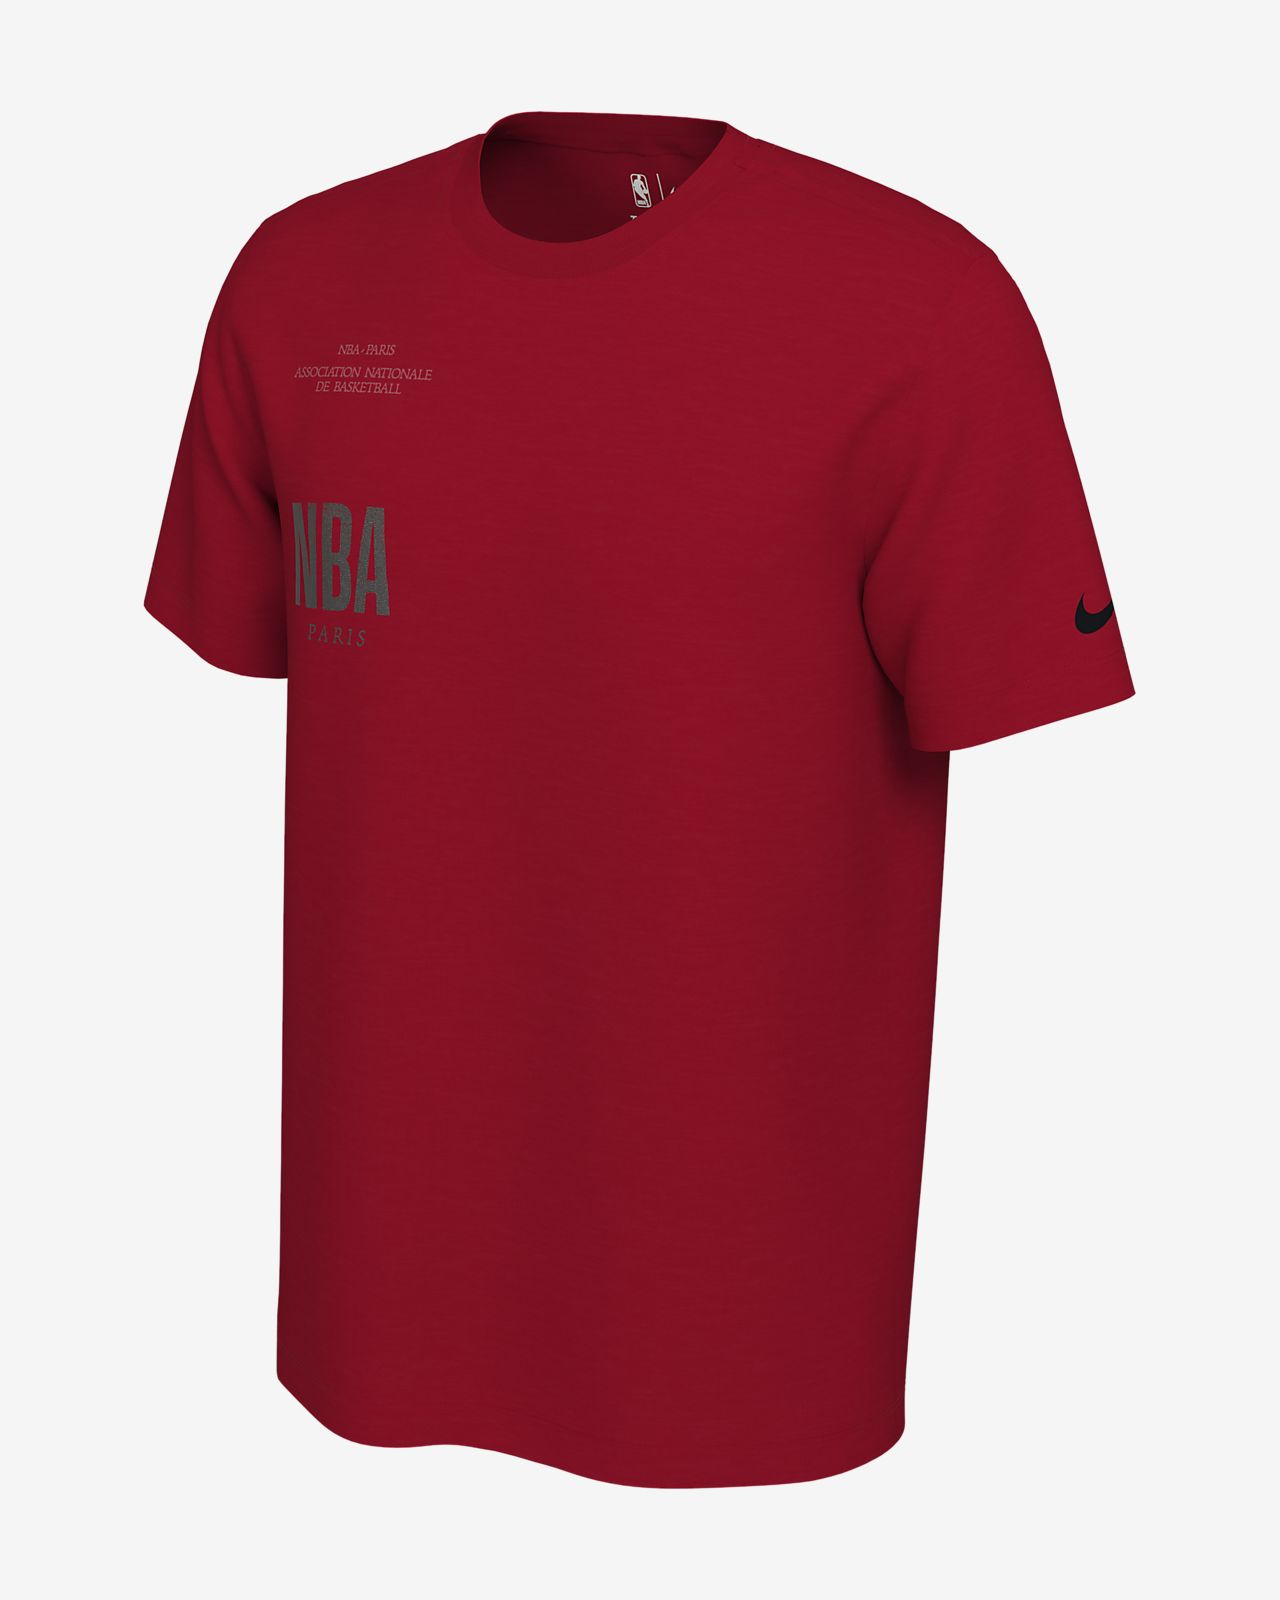 Tee-shirt NBA Nike « Paris » pour Homme